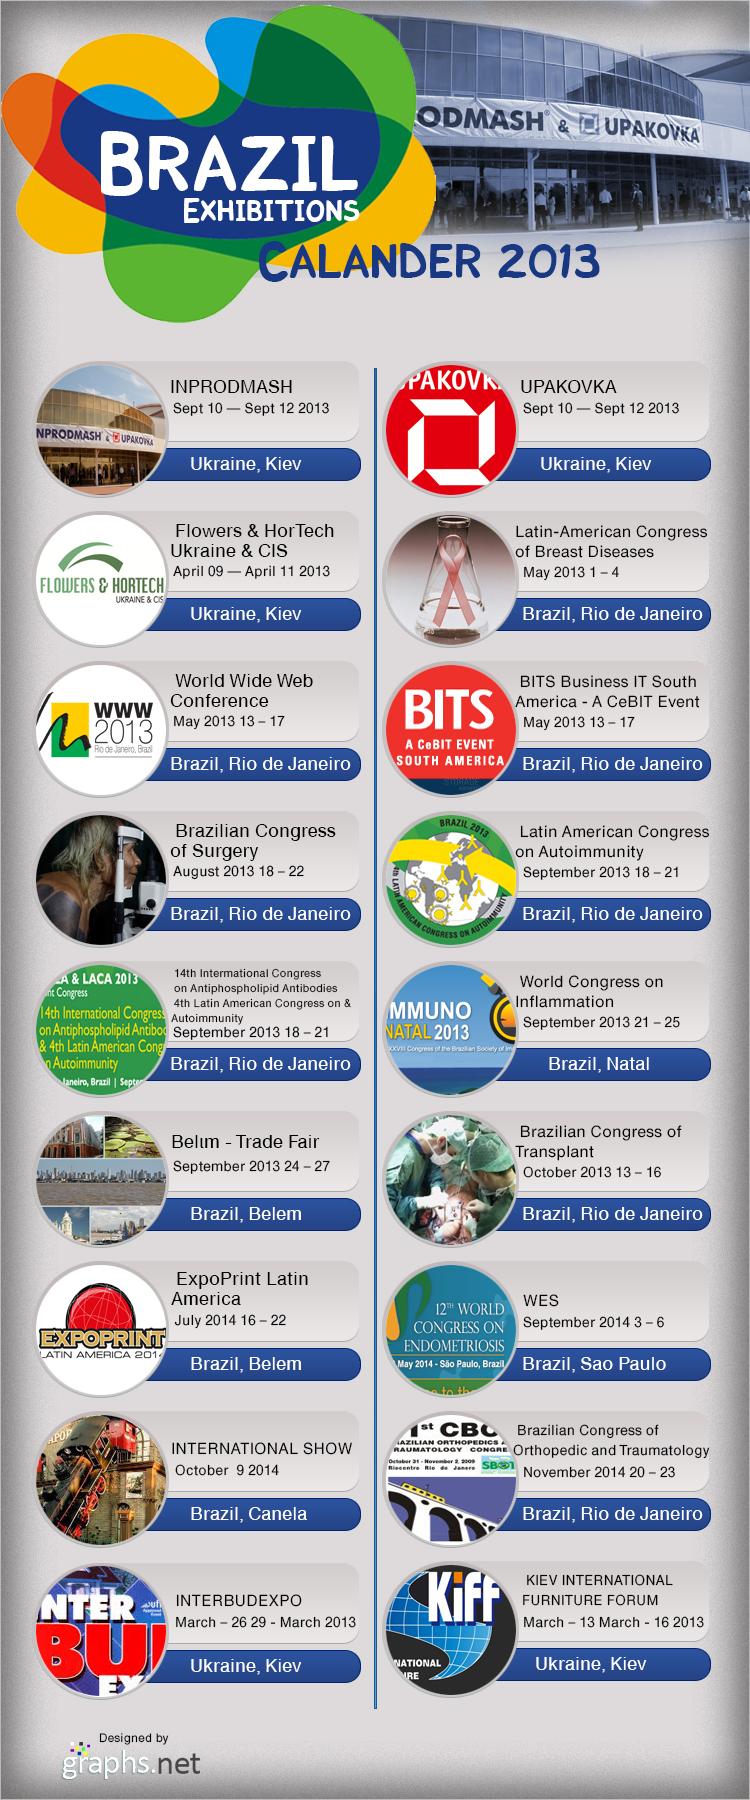 4. Brazil 2013 Exhibitions Calendar